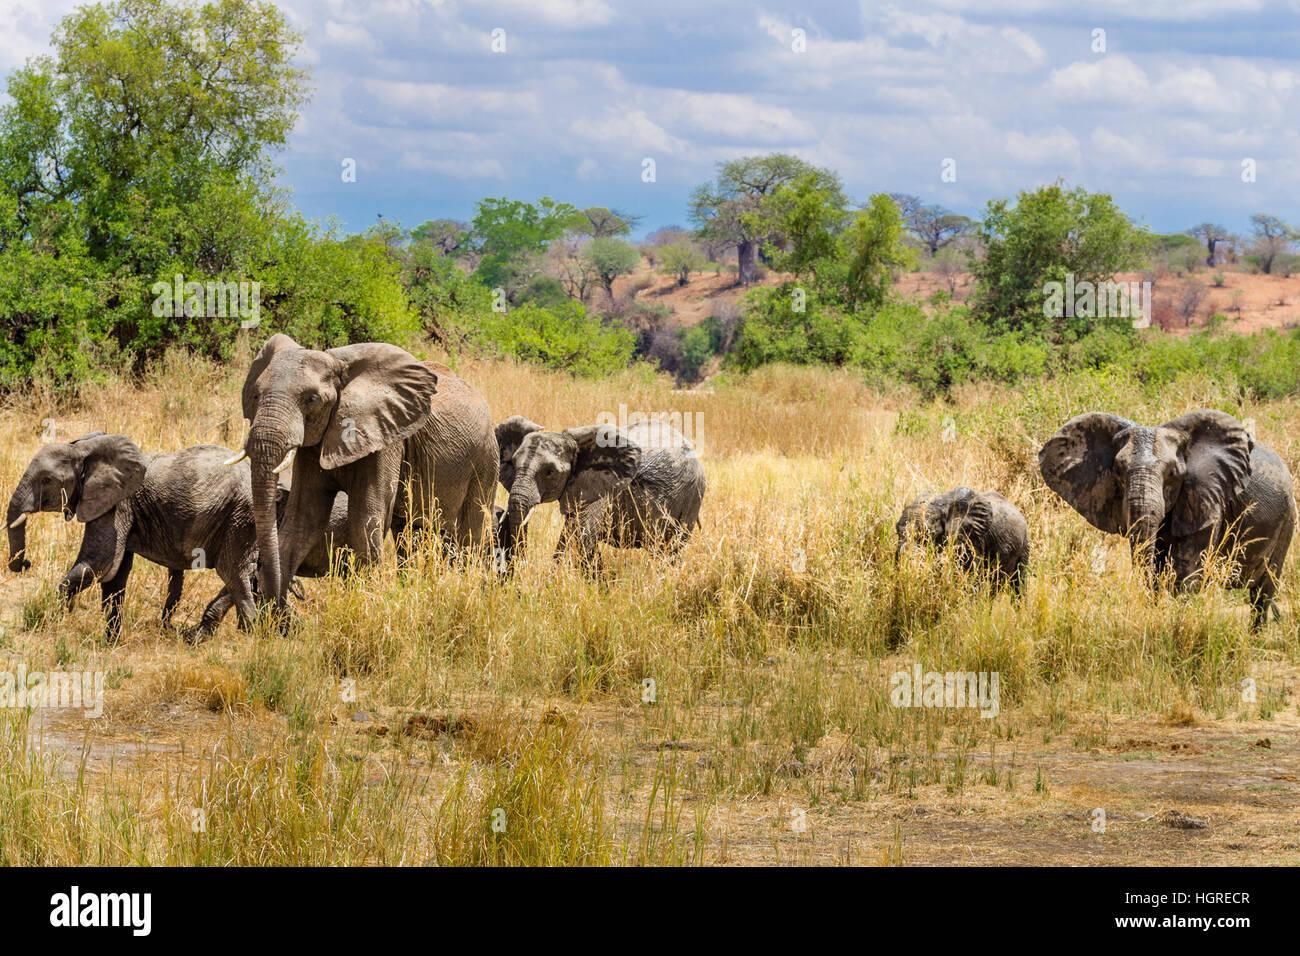 wild africa Elephants in Ruaha, safari - Stock Image